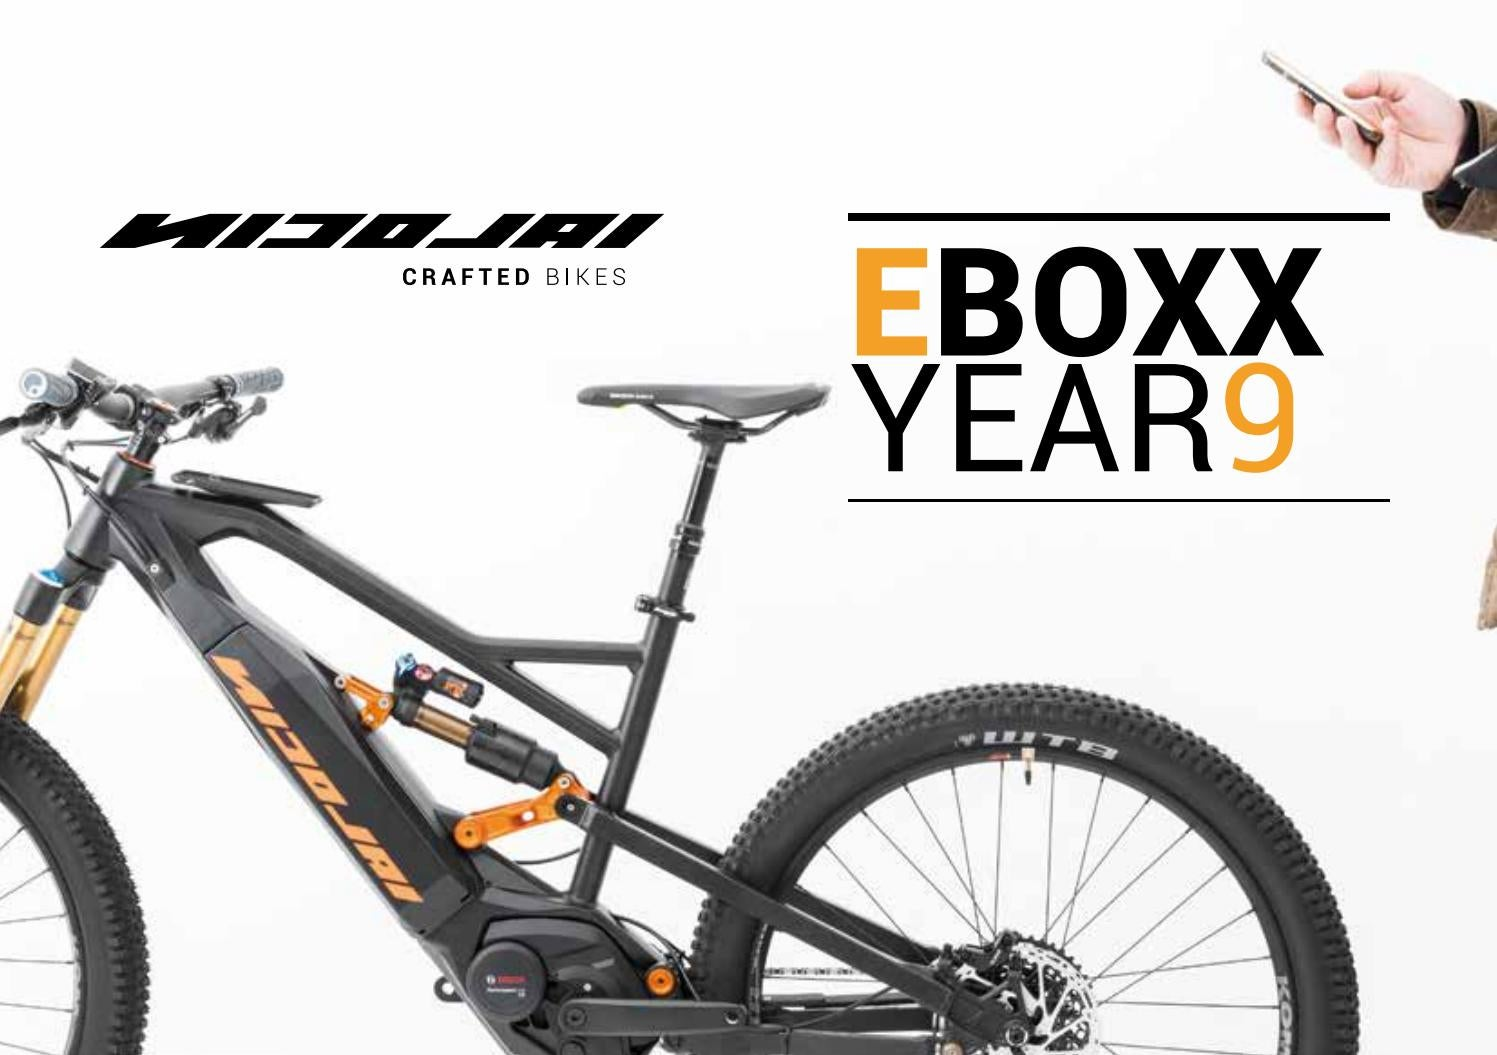 Nicolai E Boxx Catalogue 2017 By Hoshi Yoshida Issuu